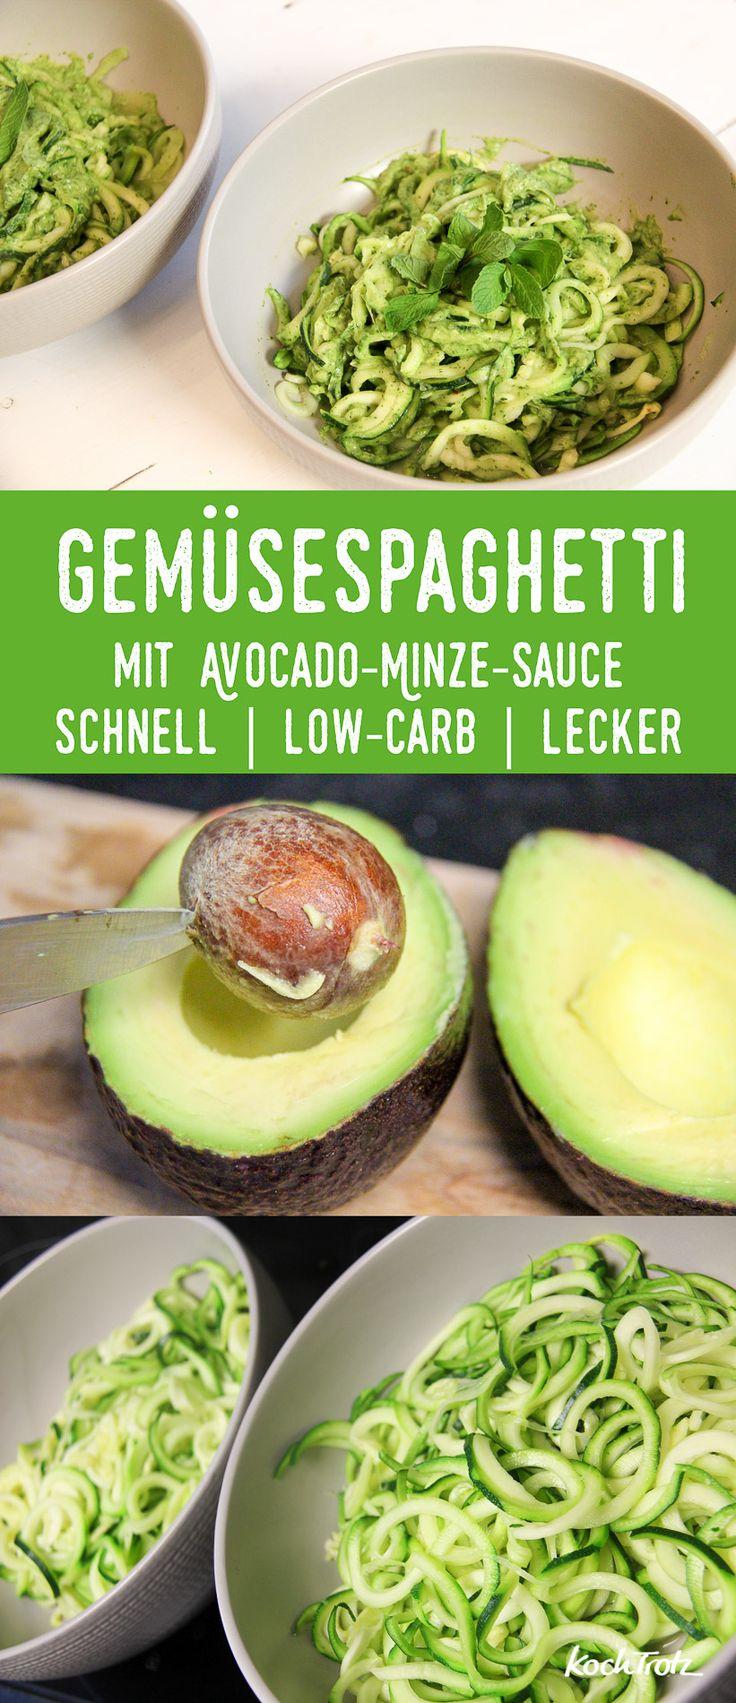 Gemüsespaghetti mit Avocado-Minze-Sauce | schnell | low-carb | lecker | Zoodles